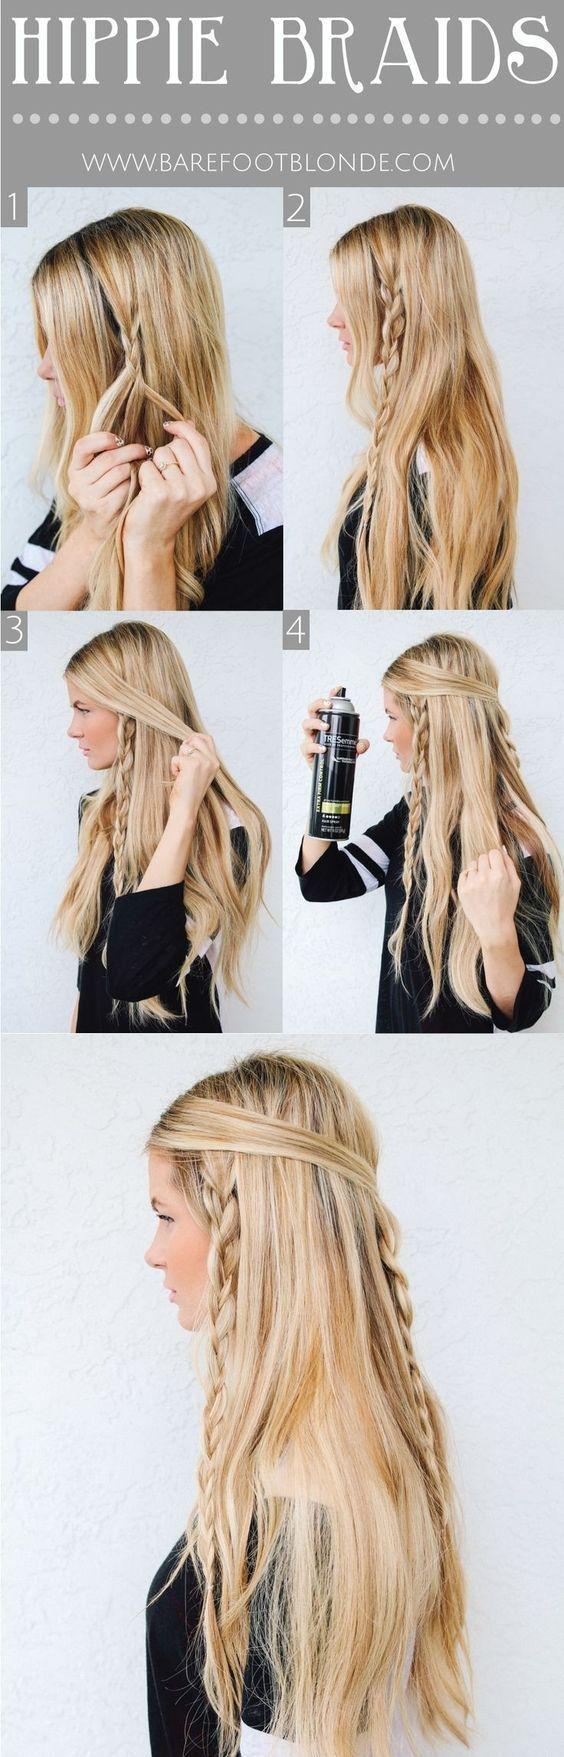 Hippie braids for long hair hair braids for kids pinterest